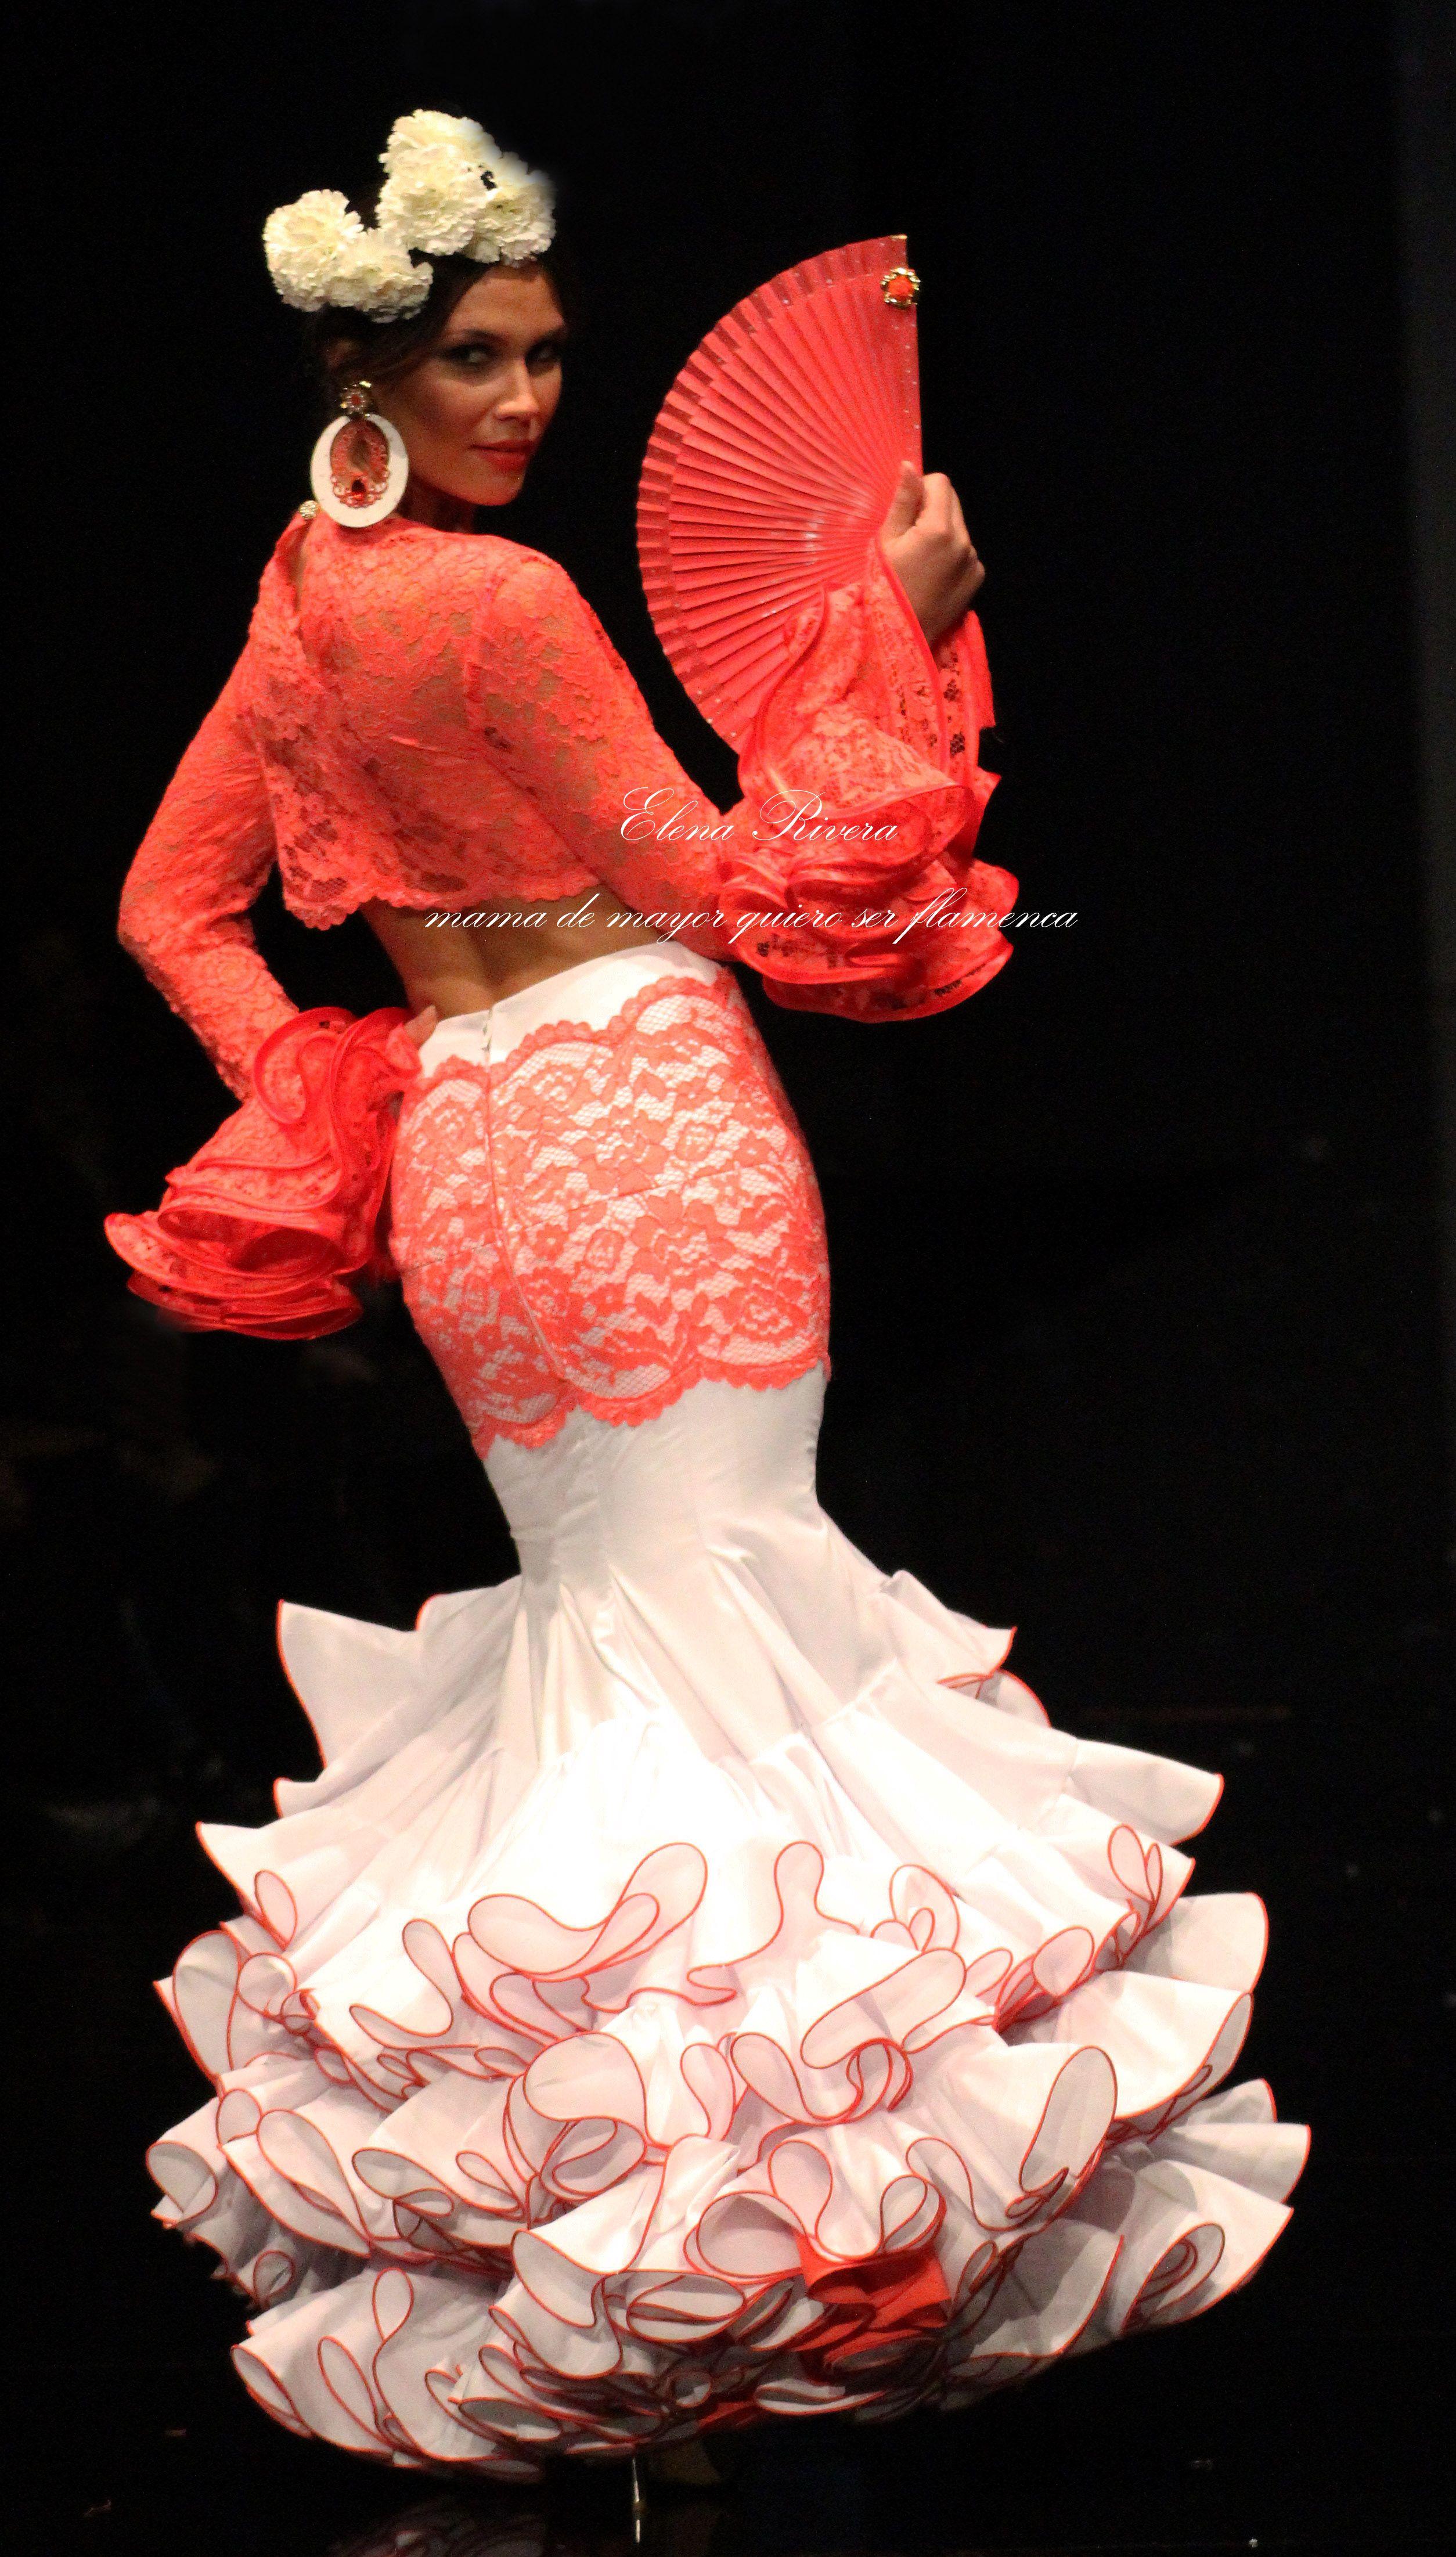 ef6aaa042 Sara de Benitez. Colección flamenca 2016 - FOTO  Elena Rivera